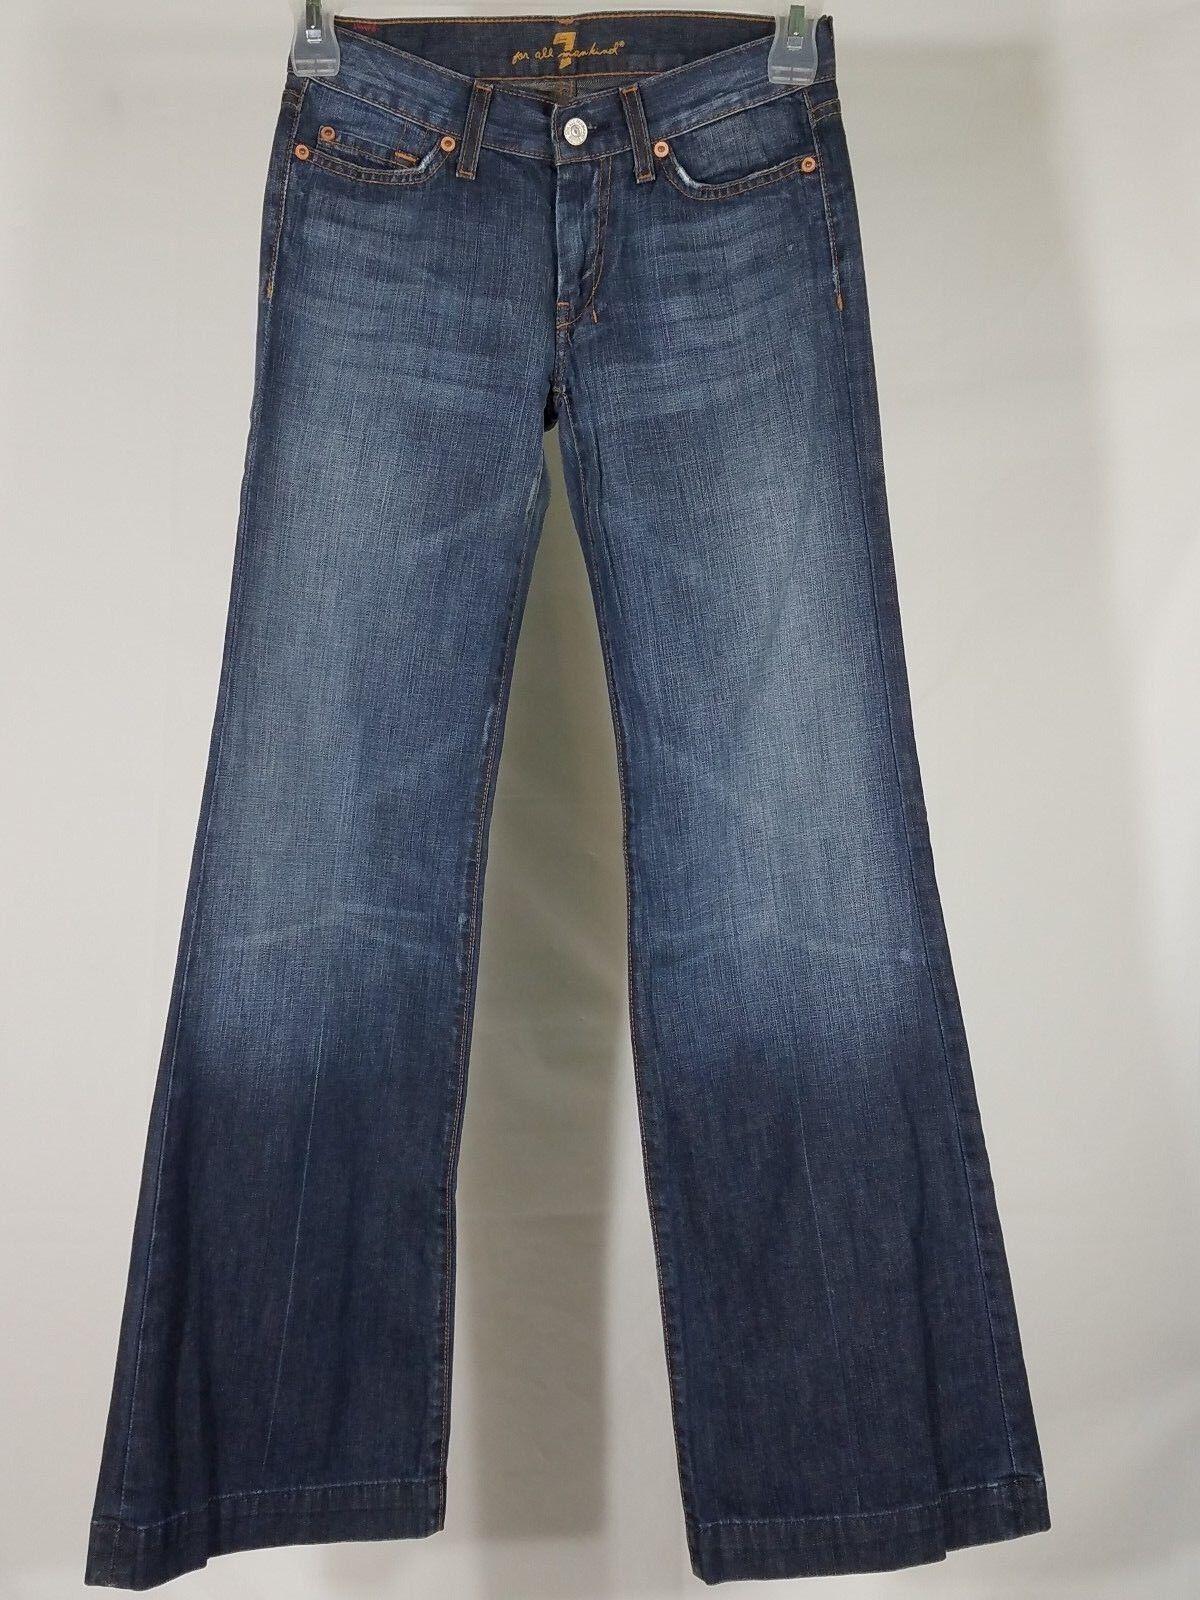 7 For All Mankind dark wash Dojo Flare denim bluee jeans ladies size 27 28W x 33L